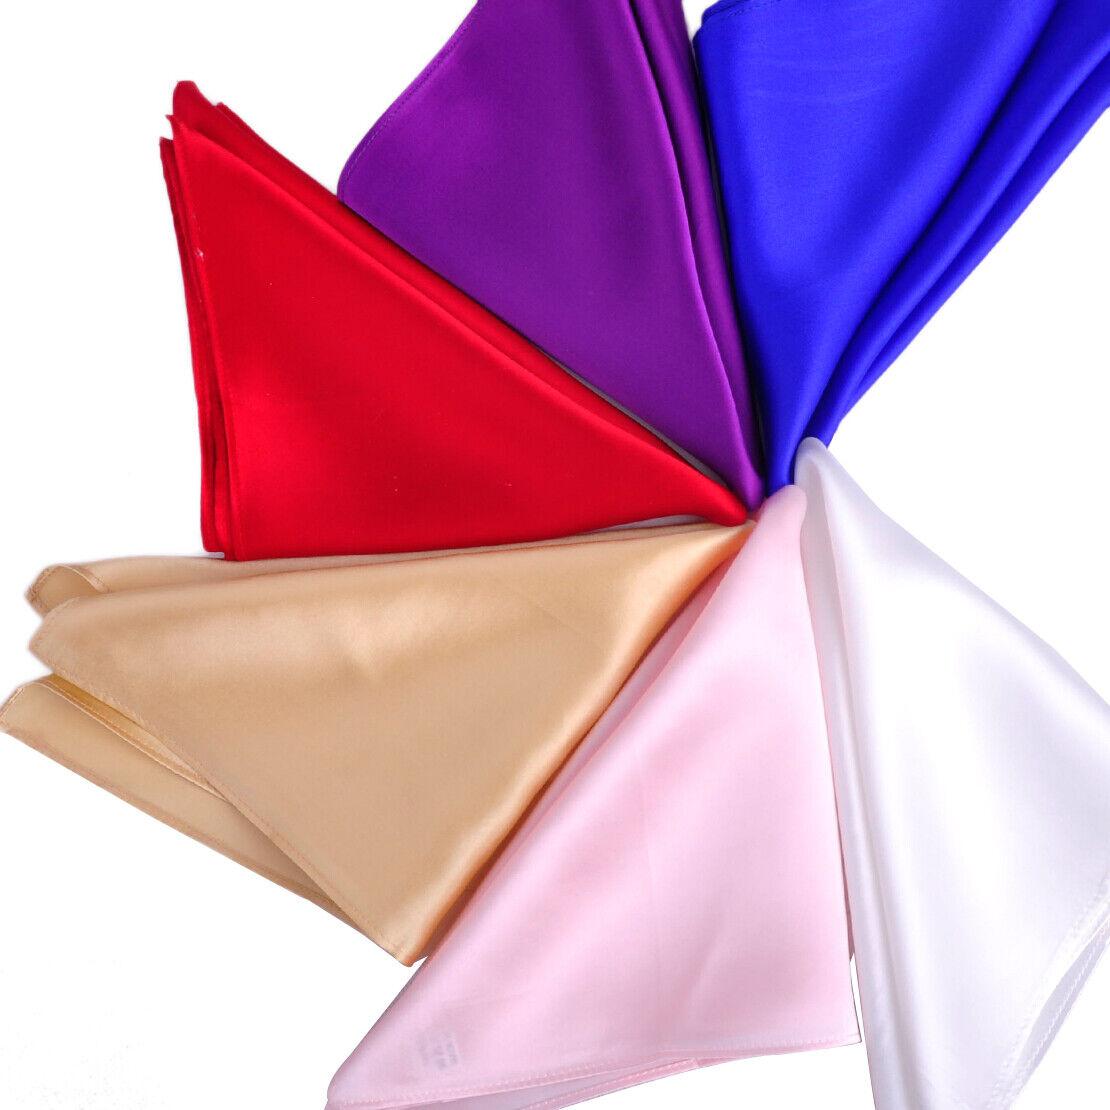 Men Formal Silk Pocket Square Handkerchief Plain Solid Color for Wedding Party